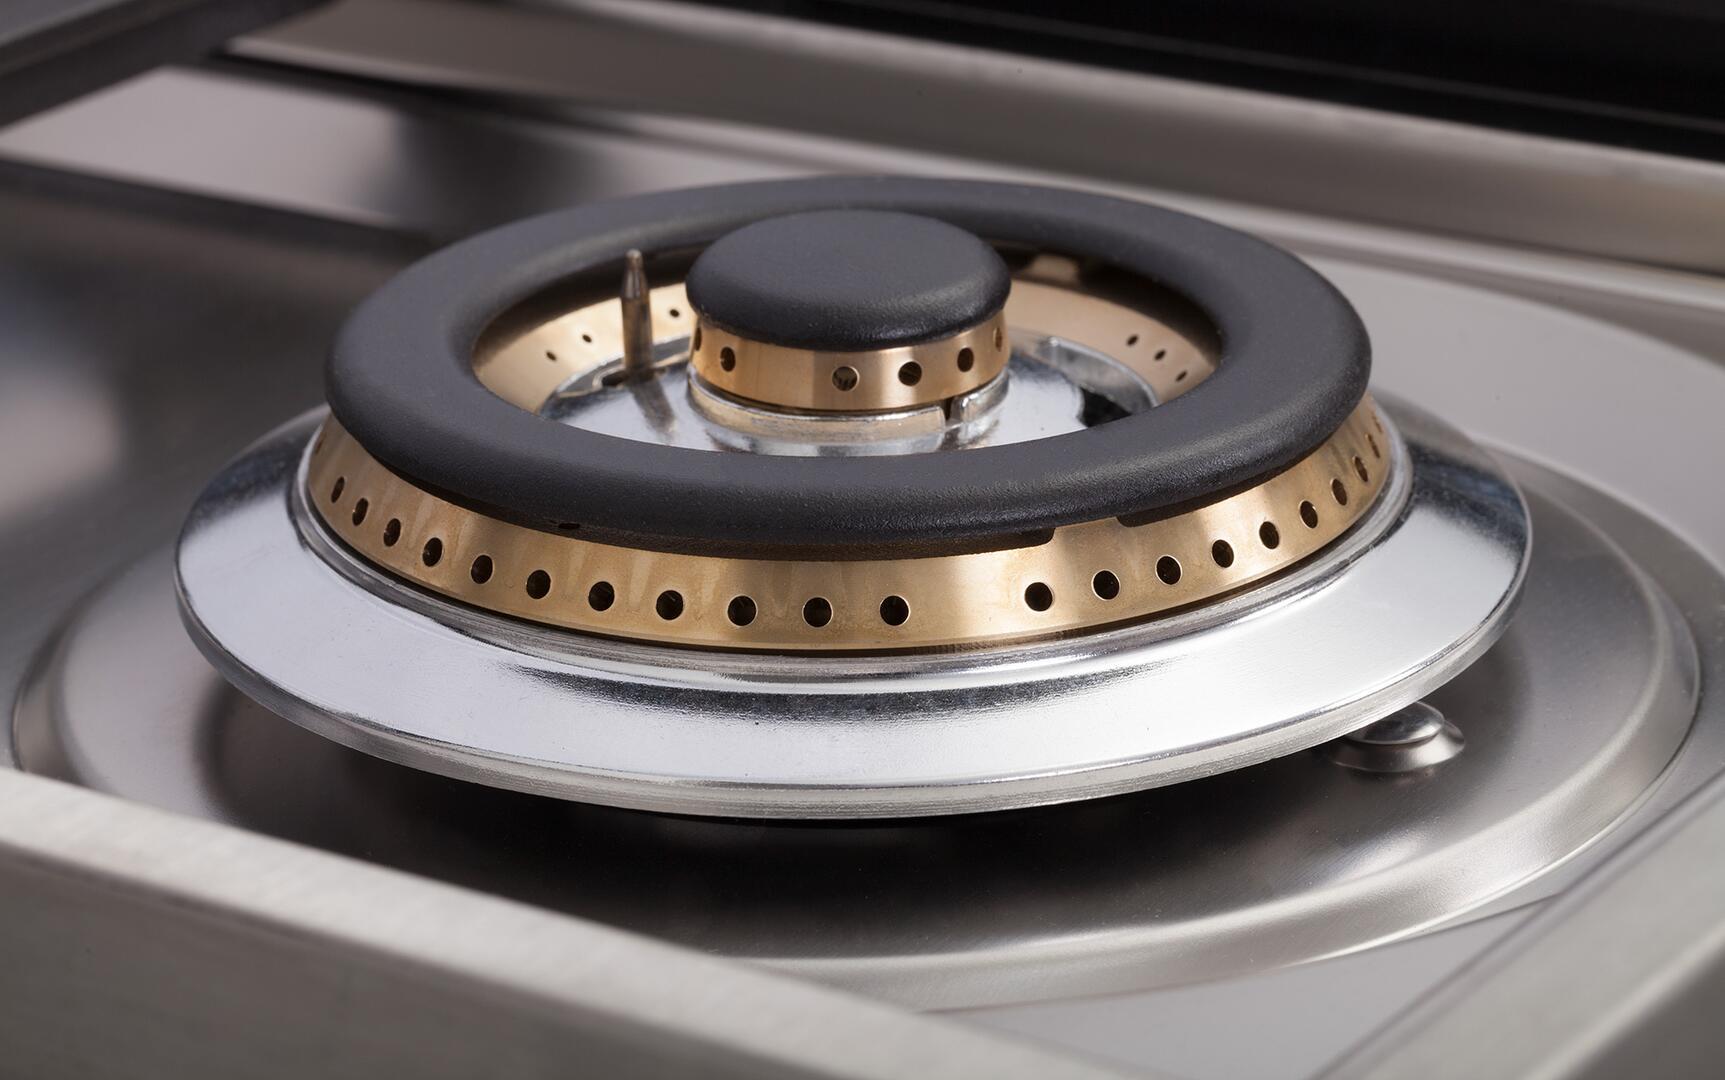 Ilve Nostalgie UPN90FDMPBL Freestanding Dual Fuel Range Blue, Dual Function Triple Ring Burner